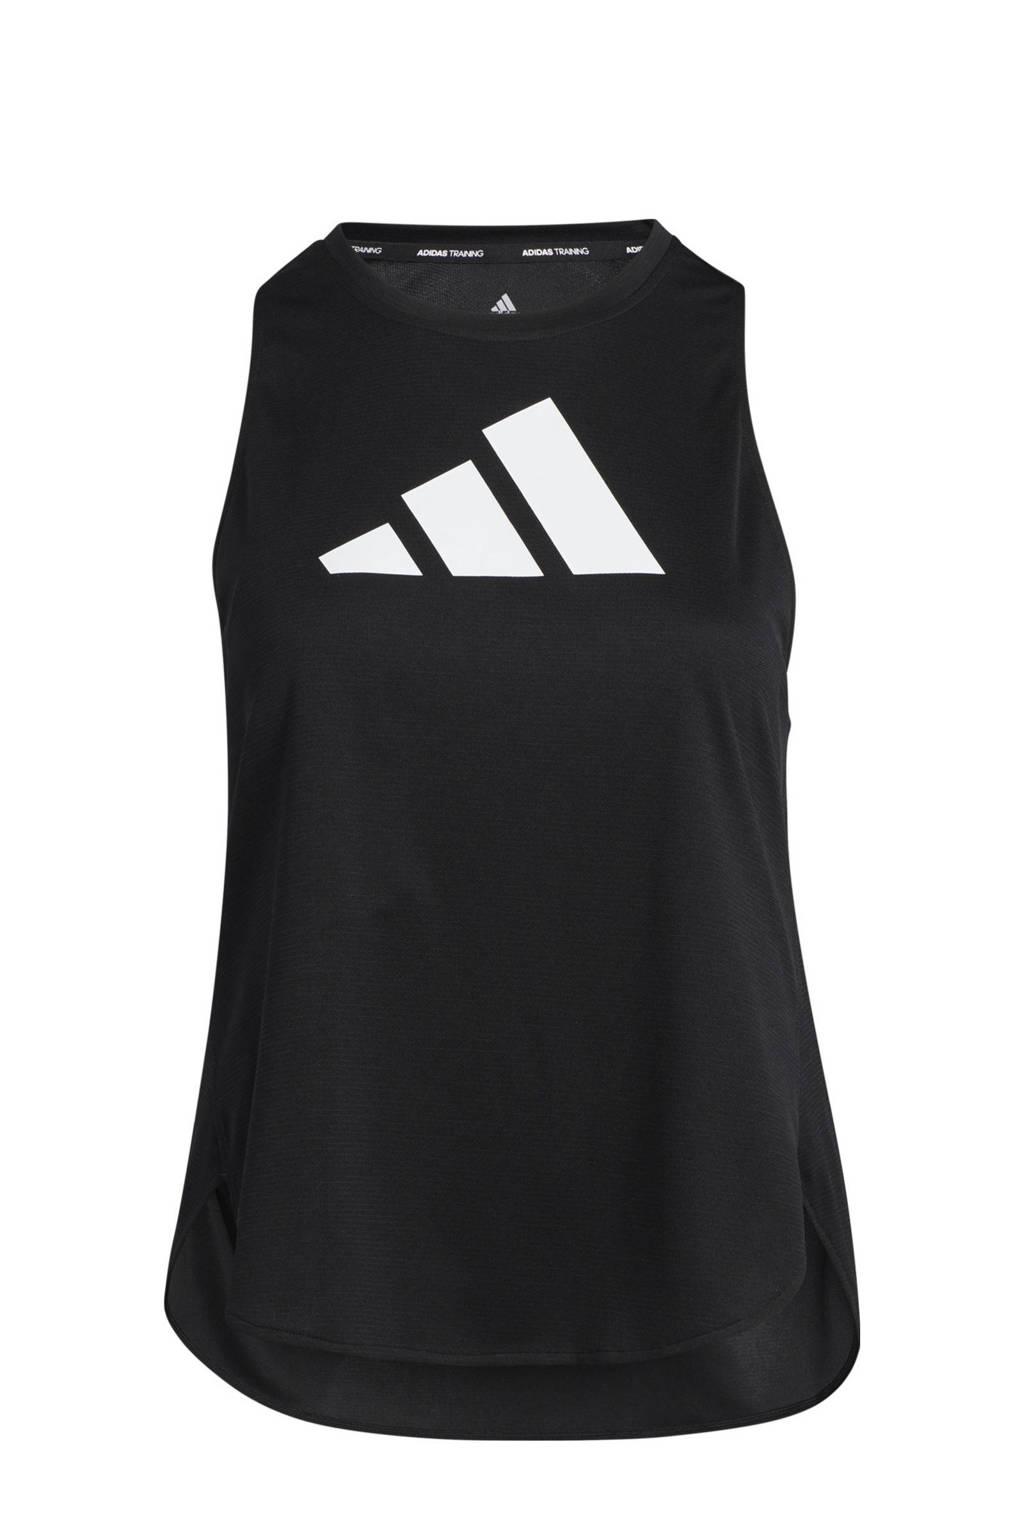 adidas Performance Plus Size Designed4Training sporttop zwart/wit, Zwart/wit